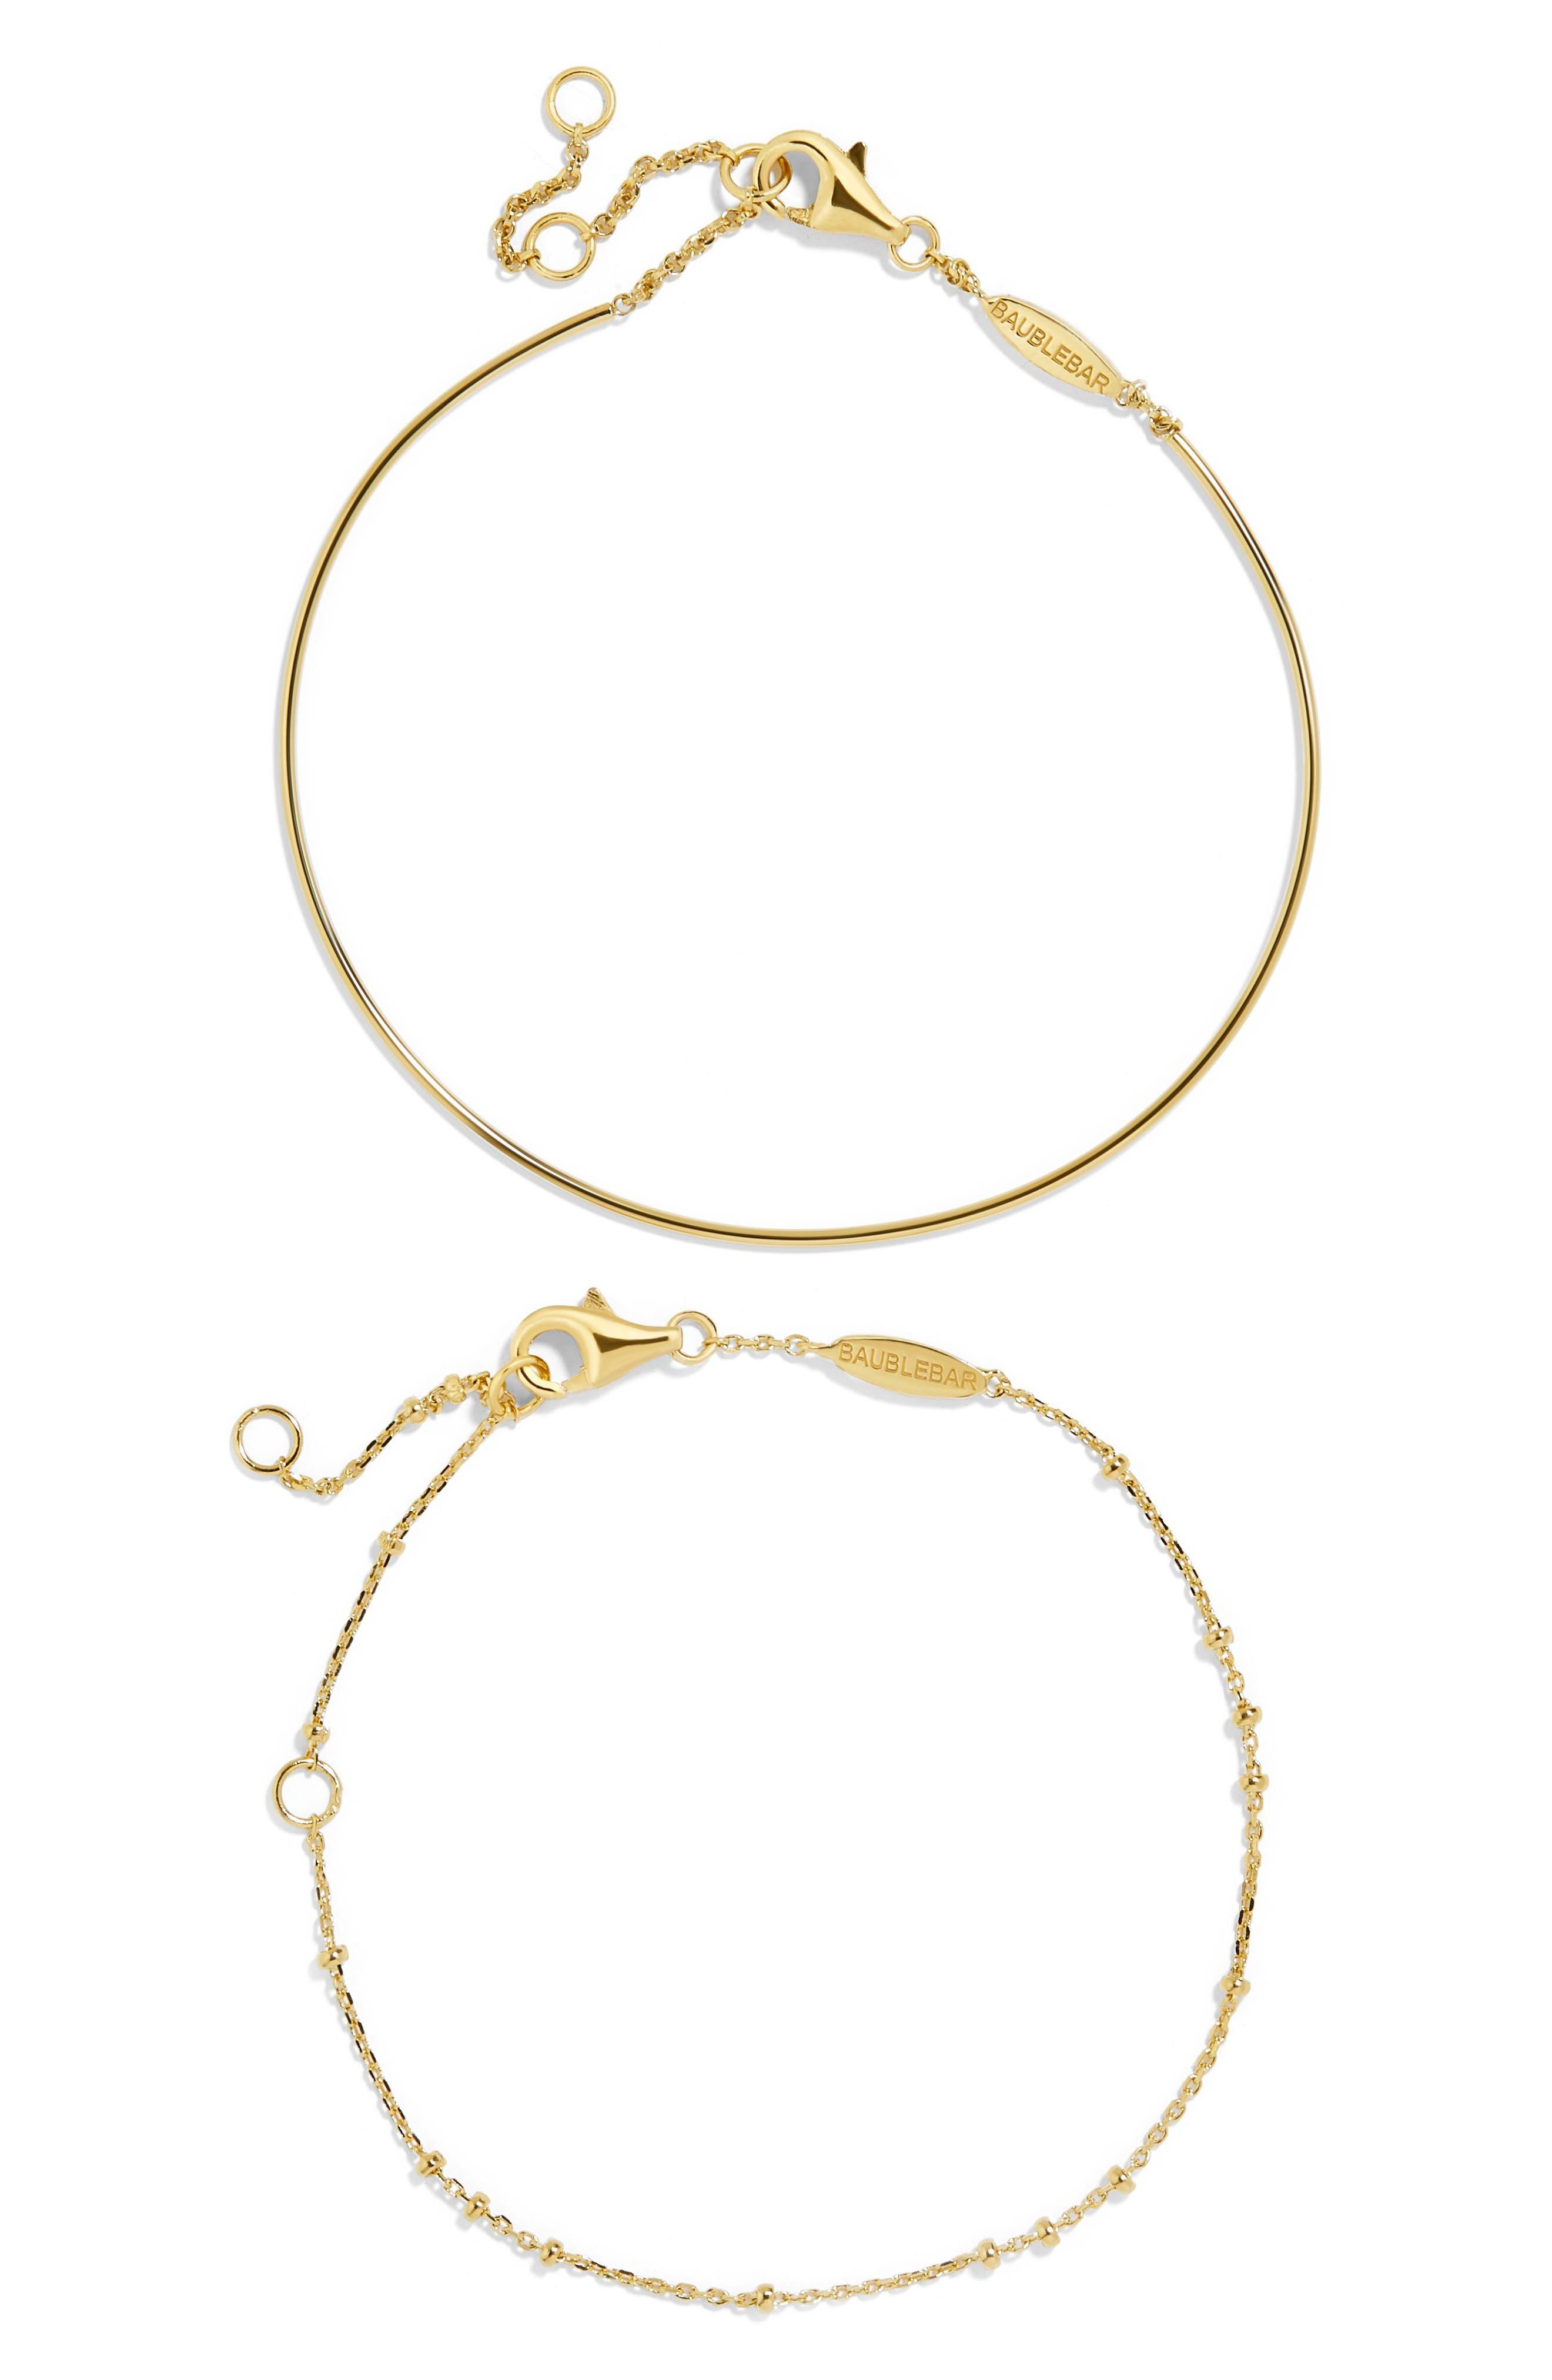 Opposto Everyday Fine Set of 2 Bracelets,                         Main,                         color, Gold